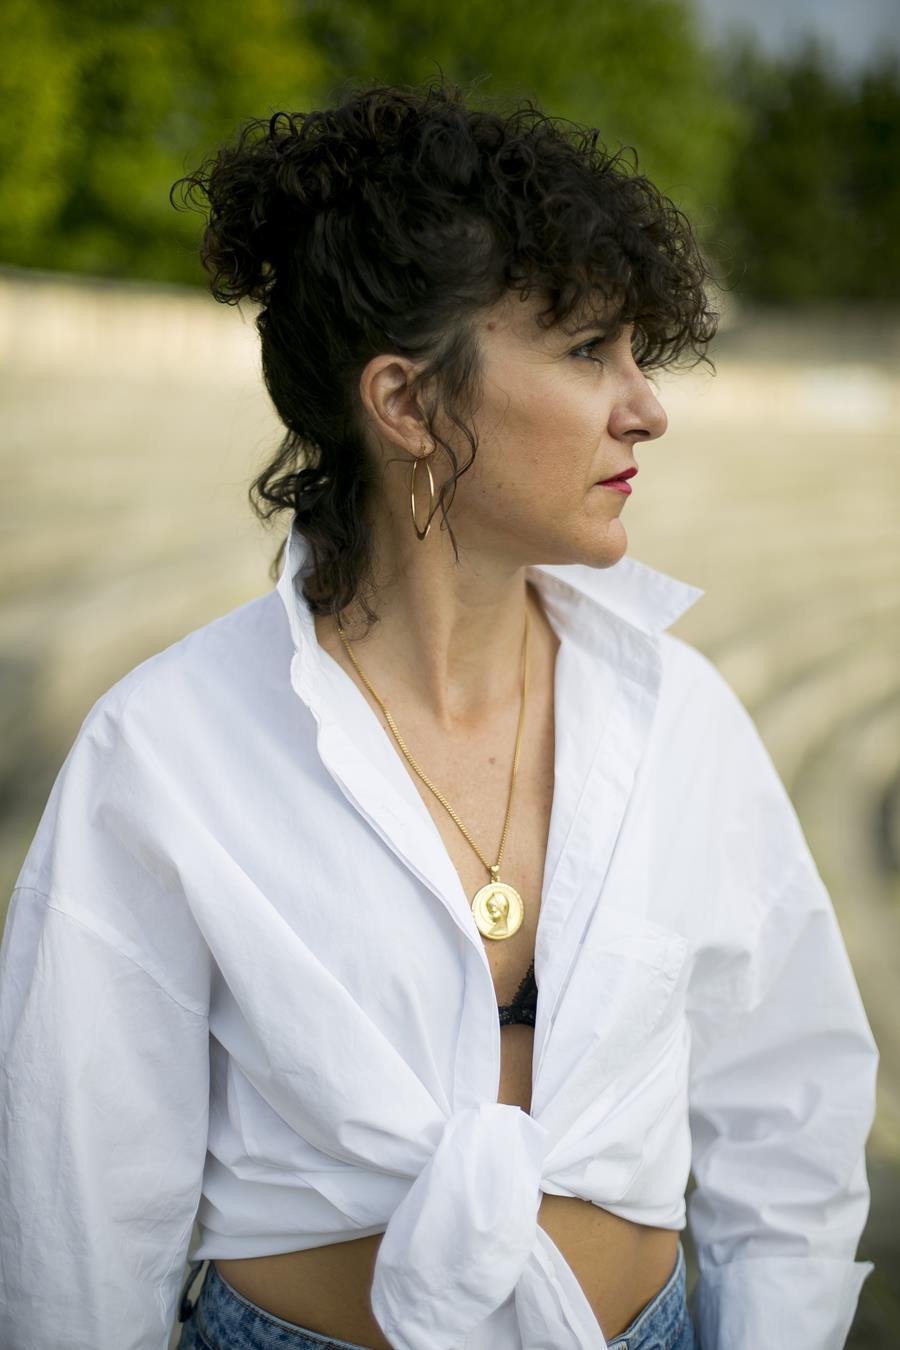 Rebeca Valdivia, asesora de imagen, personal shopper, influencer, Donostia, San Sebastián, Miss Clov, la blogger indie, Donostia, street style, ootd, moño, falda vaquera, denim, camisa blanca, white shirt, stilettos, animal print, clutch, tachuelas